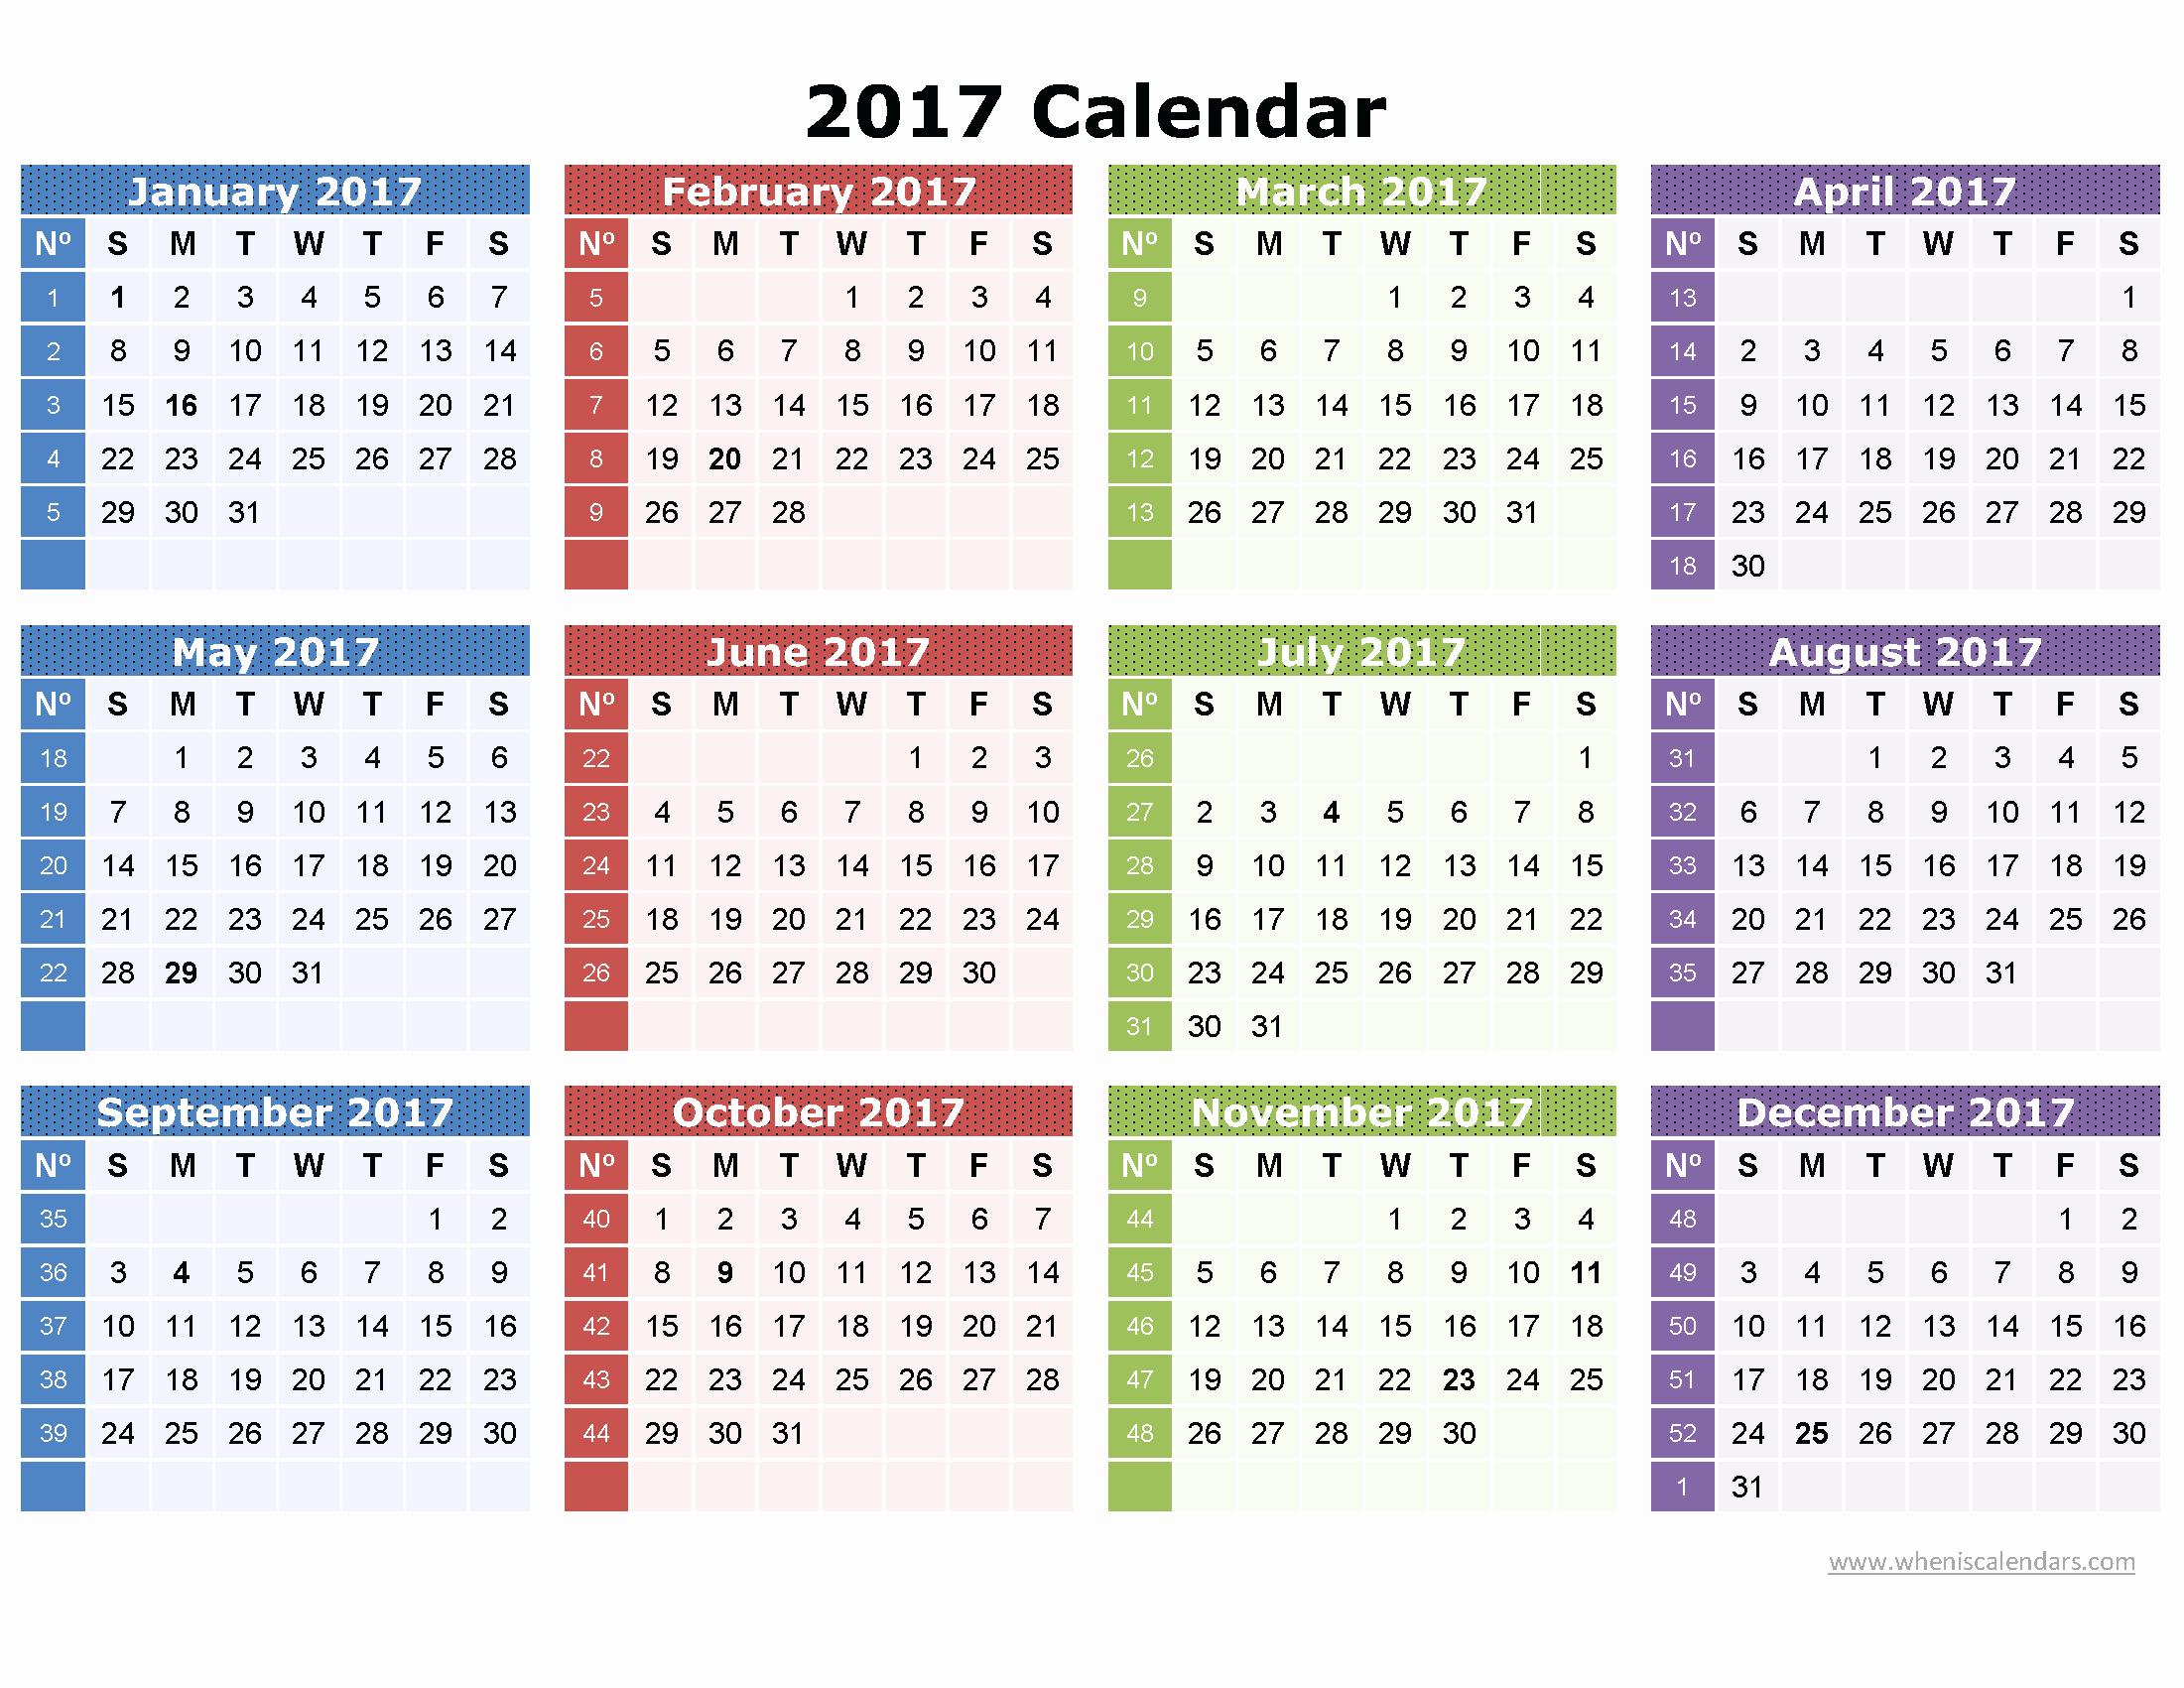 Printable Full Year Calendar 2017 Best Of 2017 Year Calendar Wallpaper Download Free 2017 Calendar